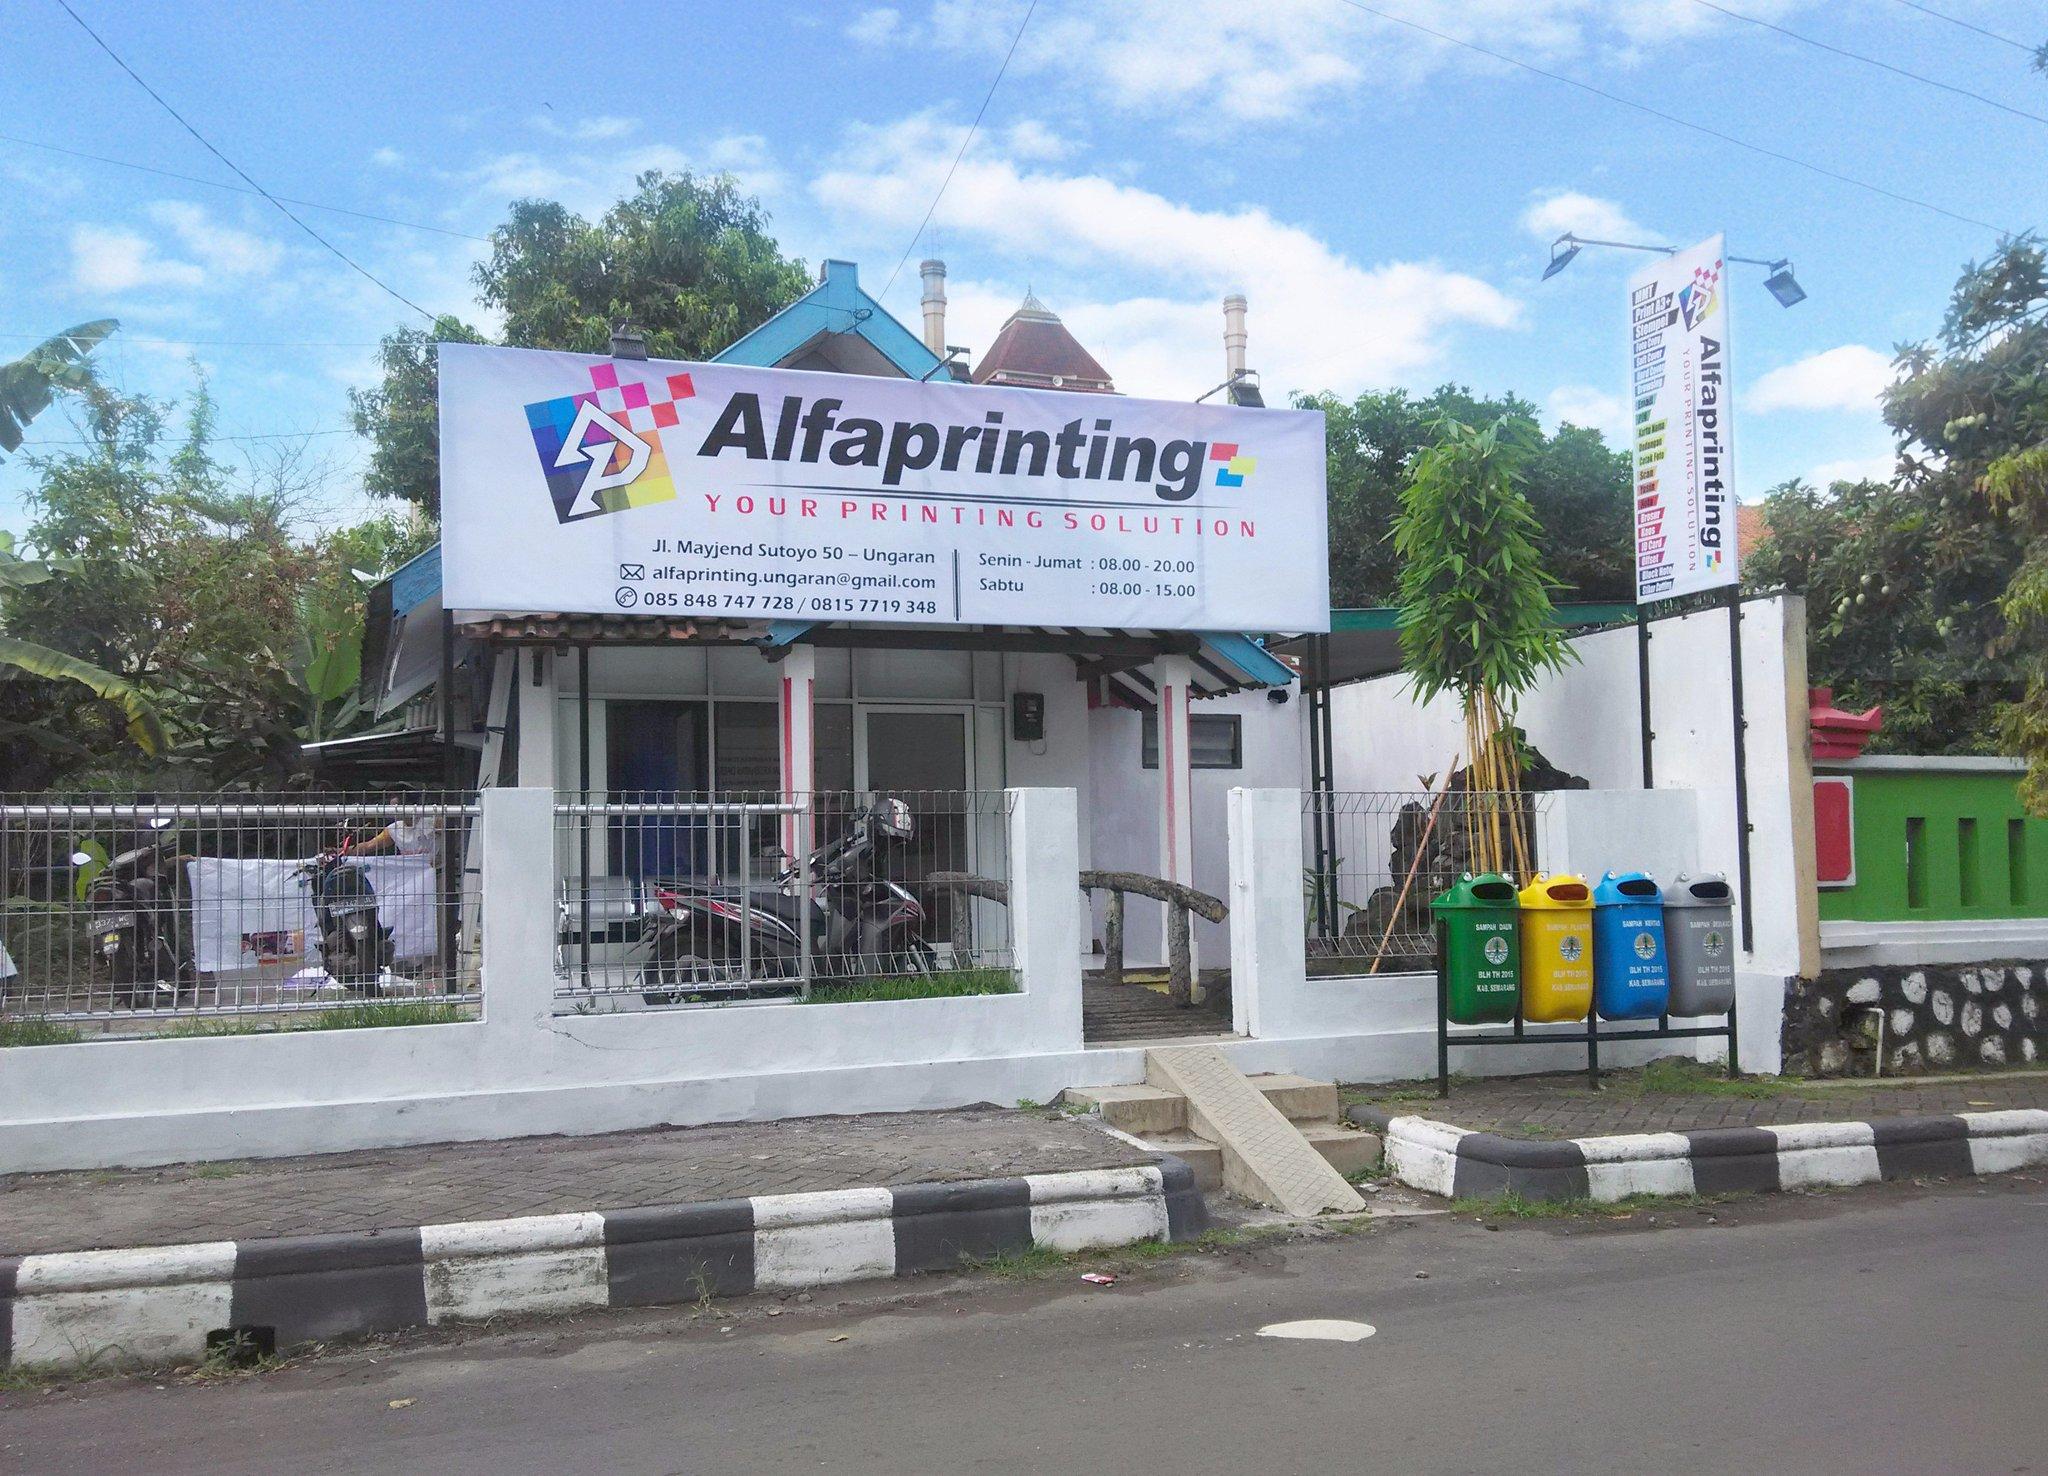 Garin Twitter Jl Mayjend Sutoyo 50 Ungaran Kab Semarang Utara